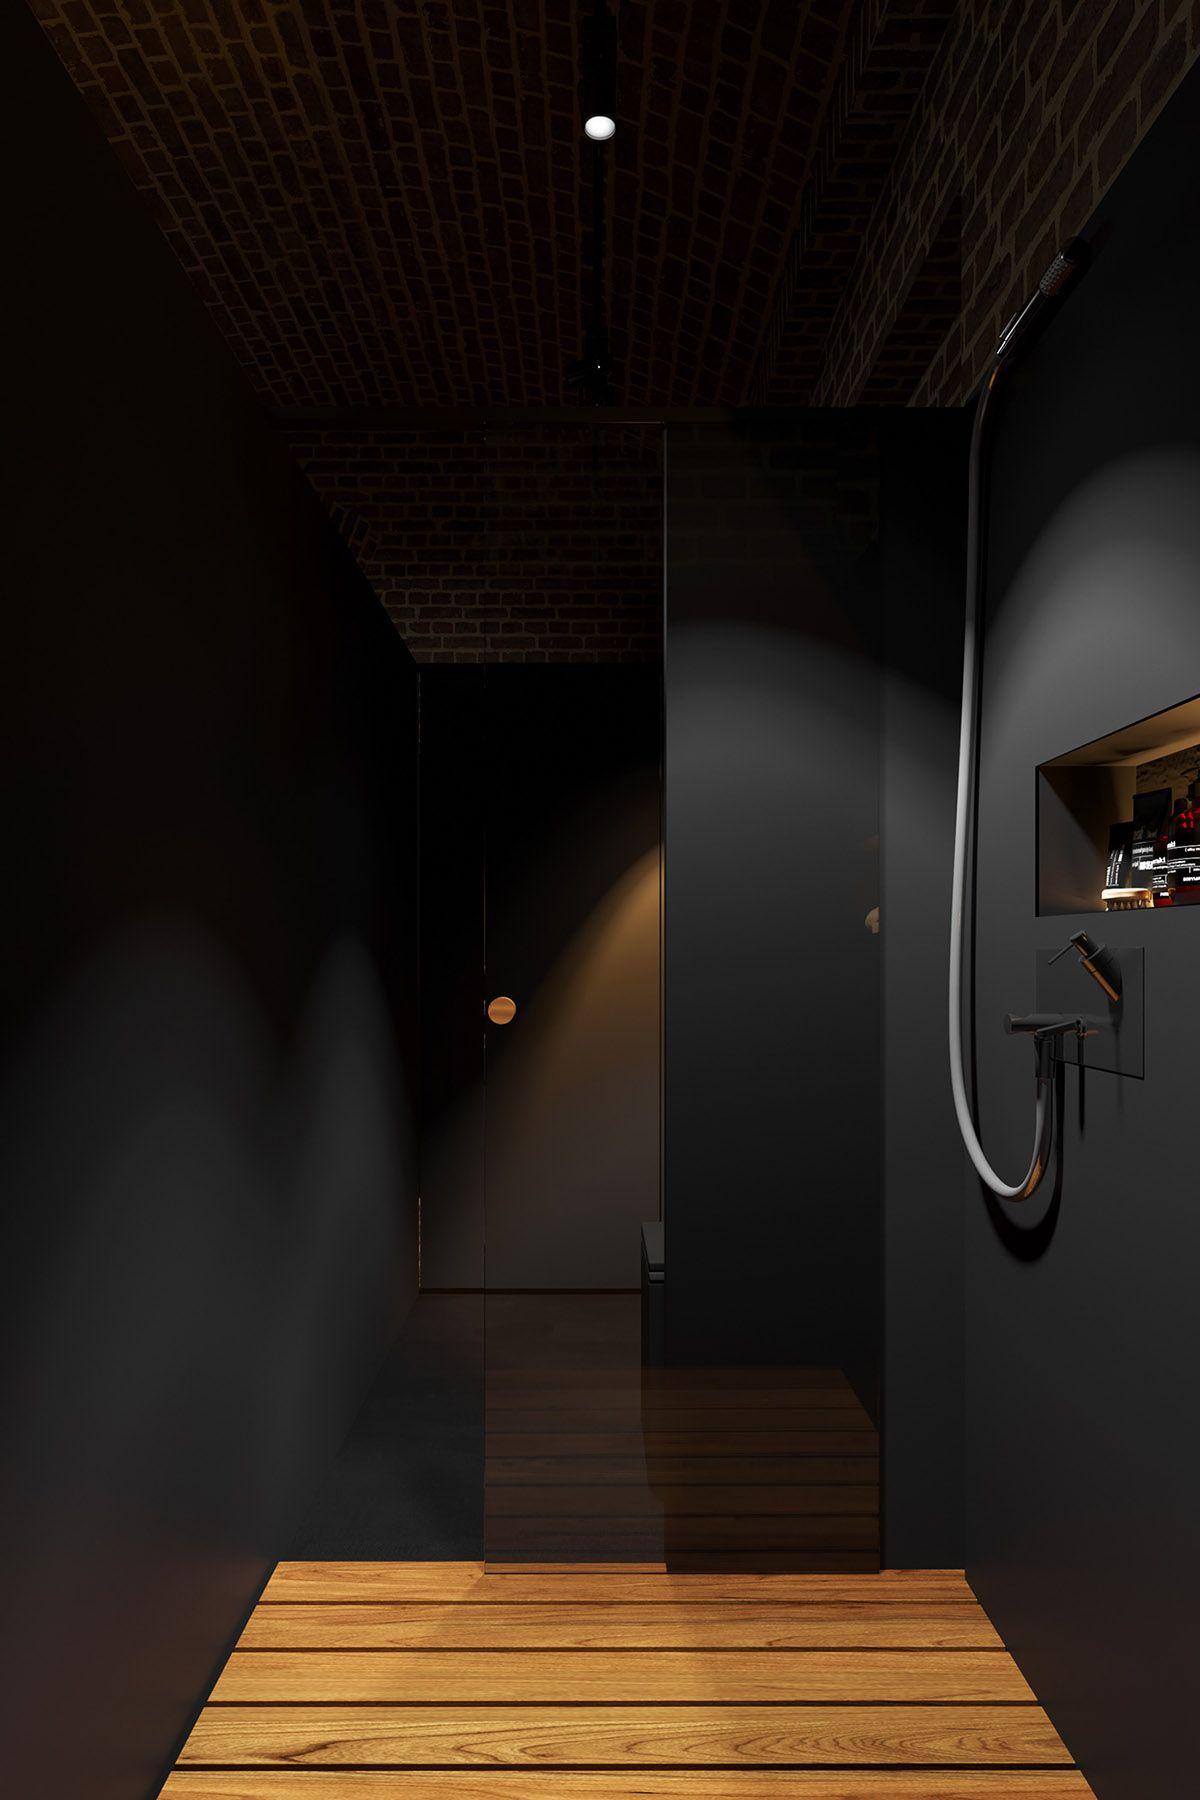 Bathroom interior hd modern dark interior design in   hd dark interior design